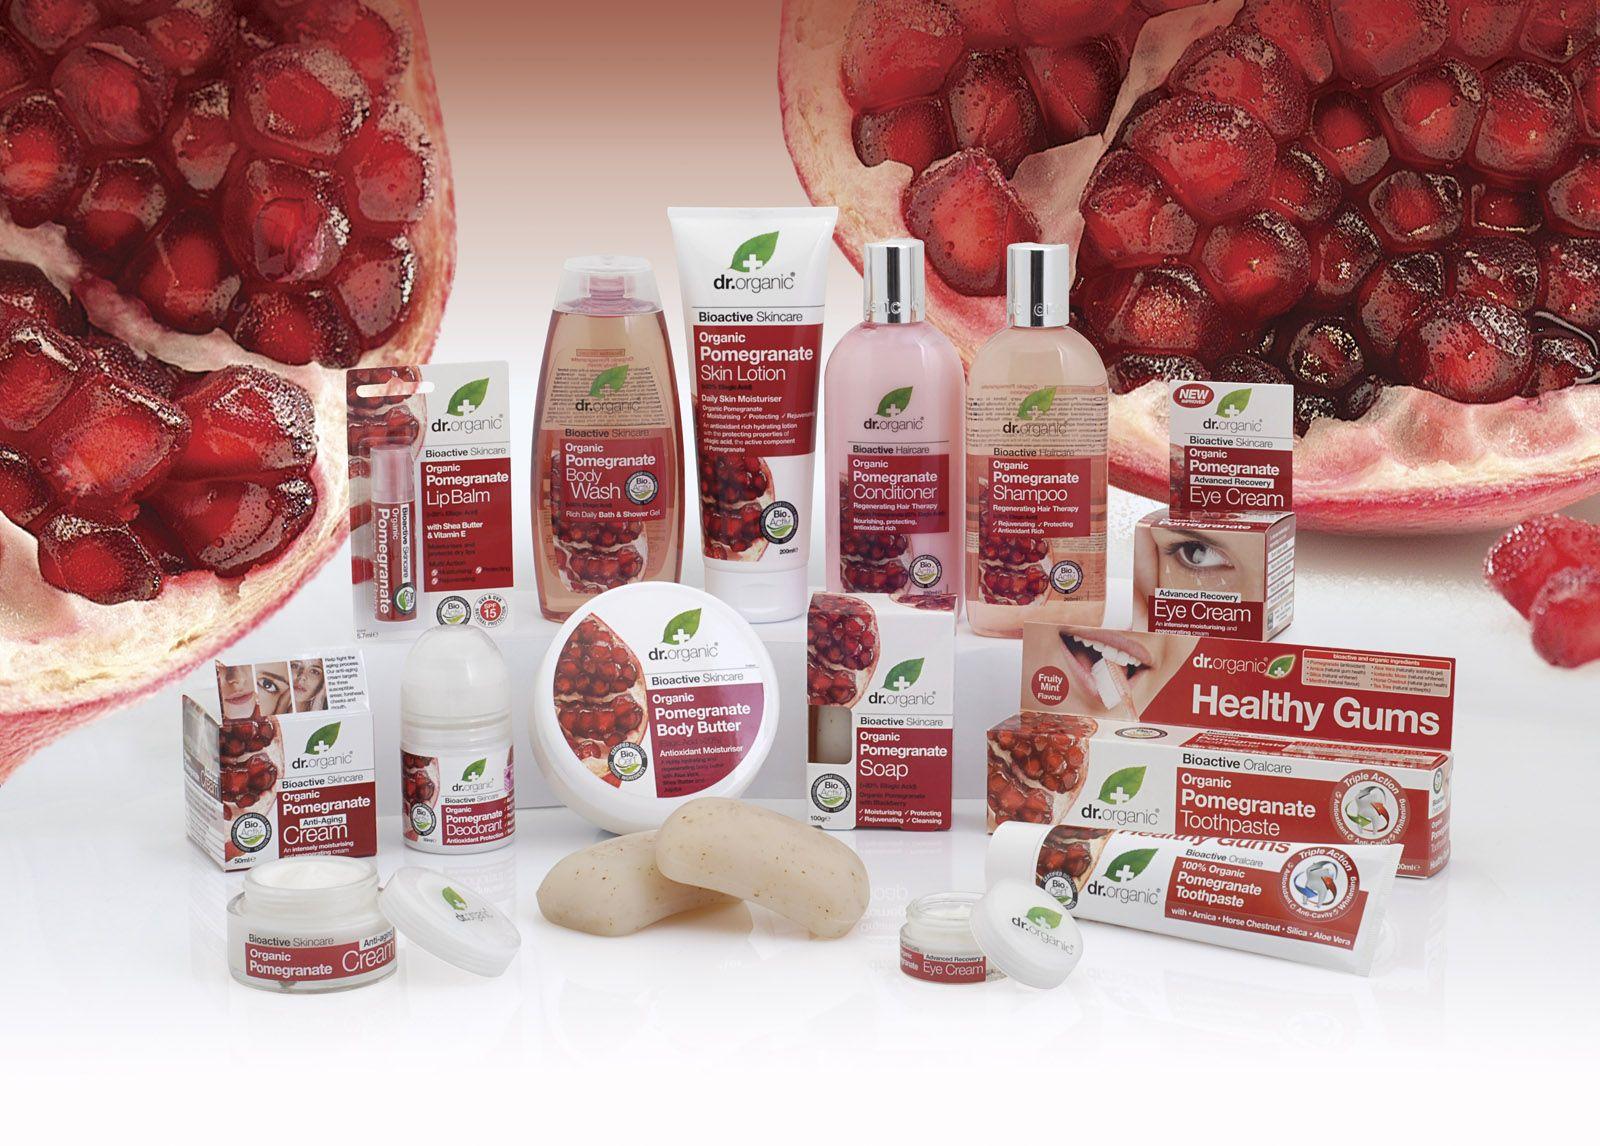 Pomegranate A4